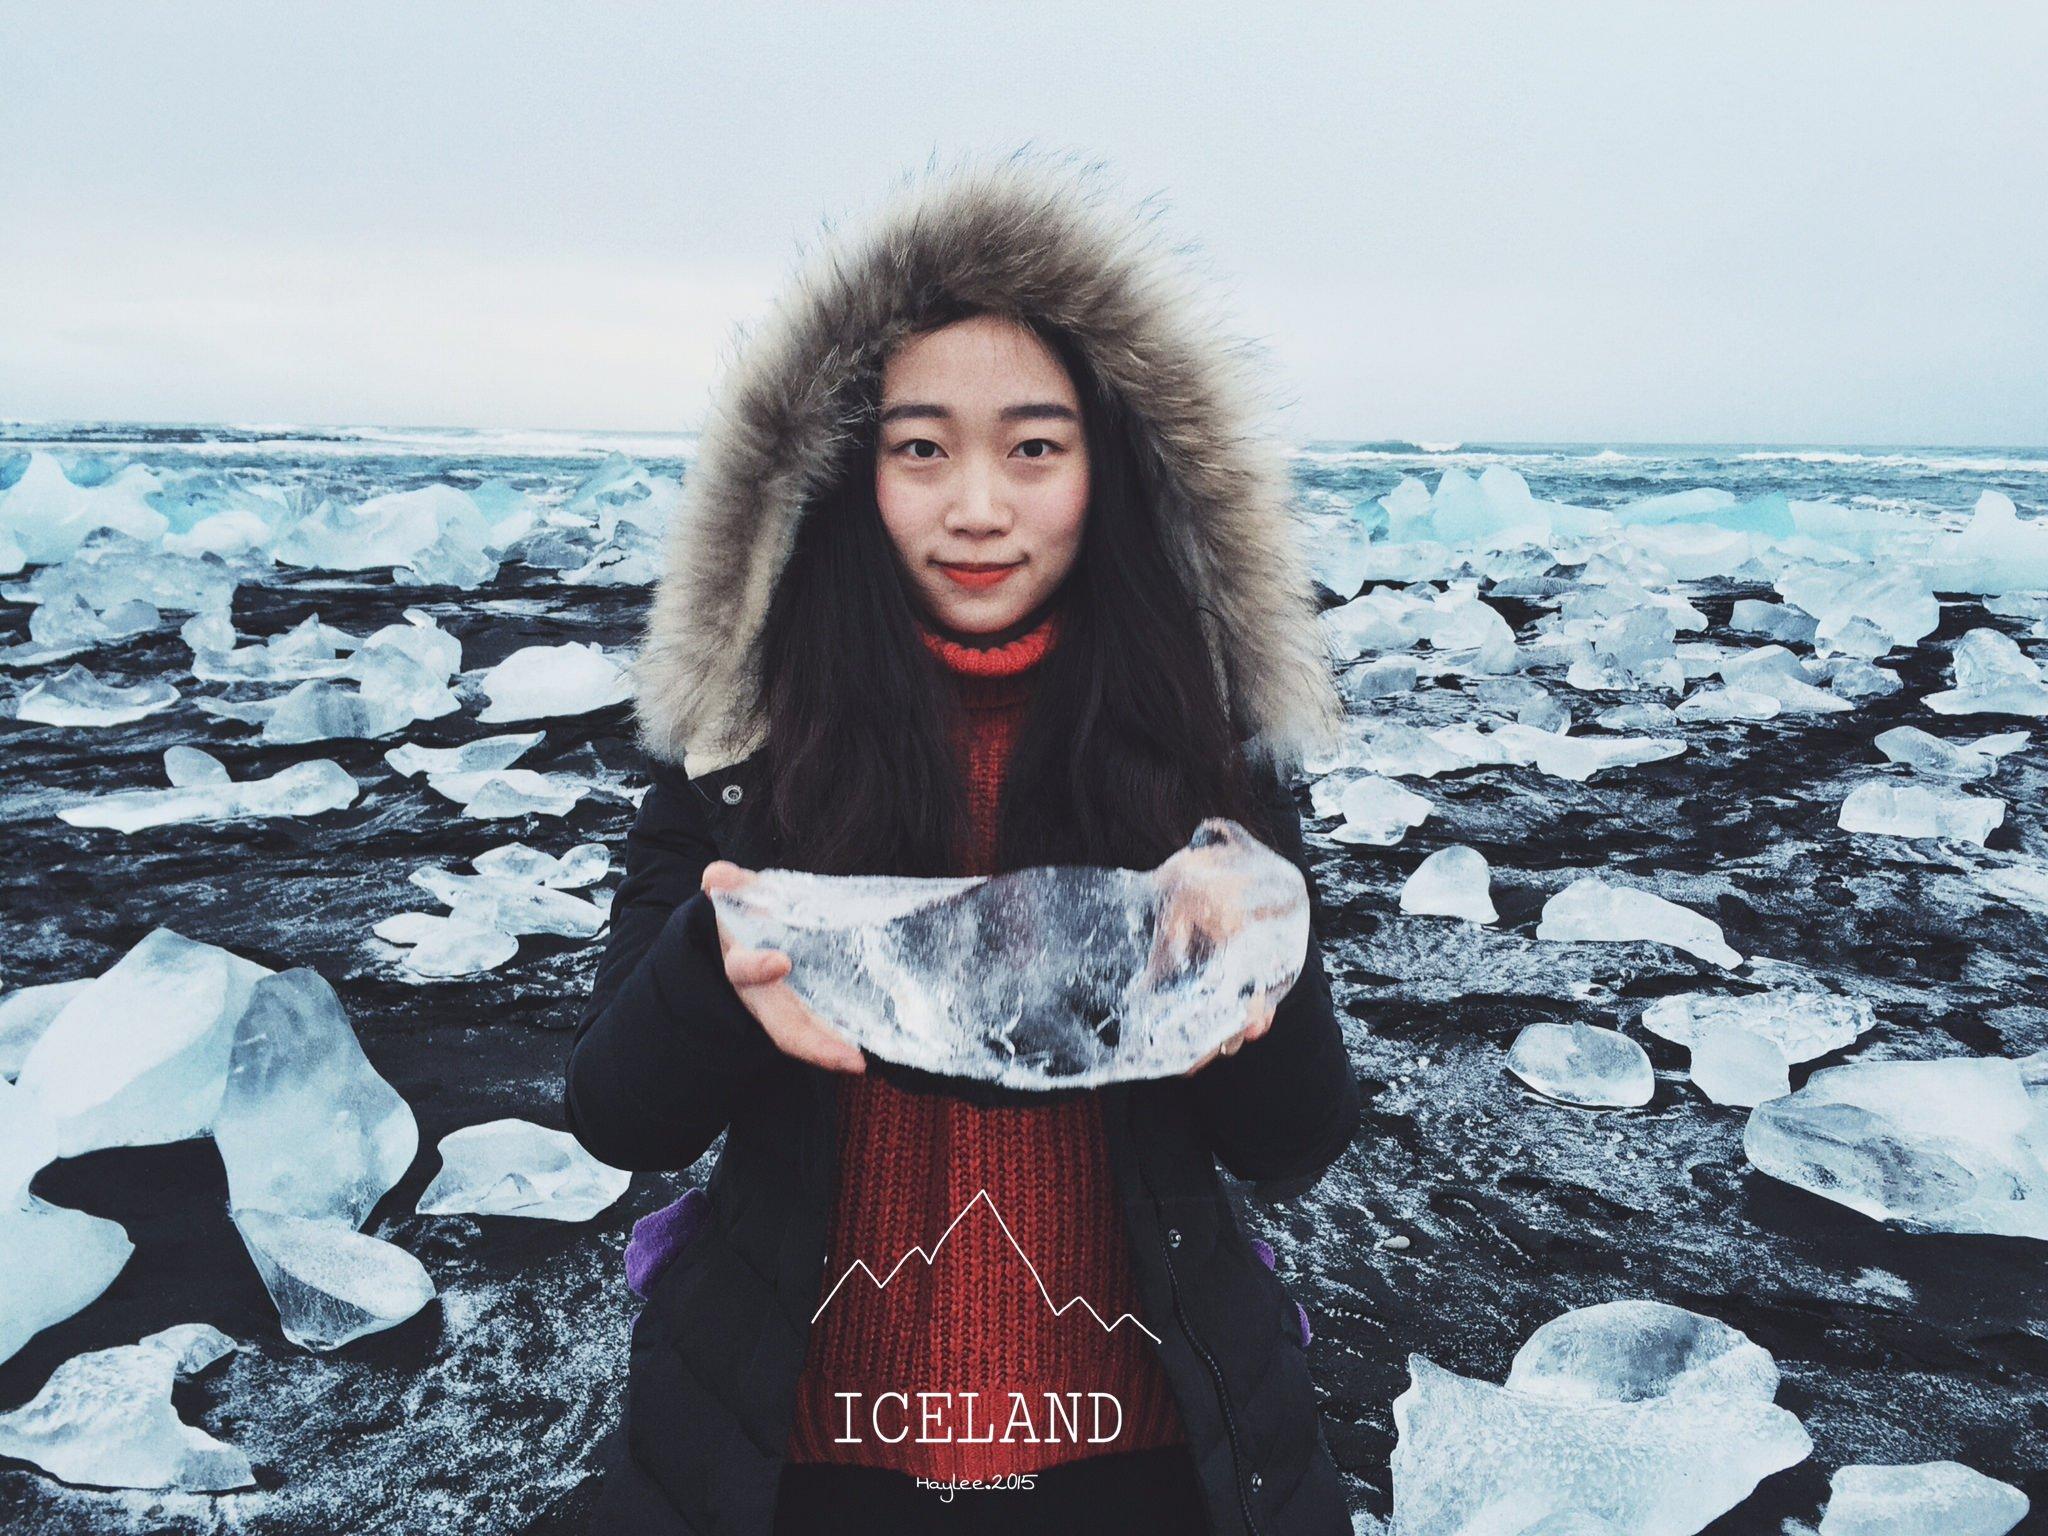 Iceland women pics